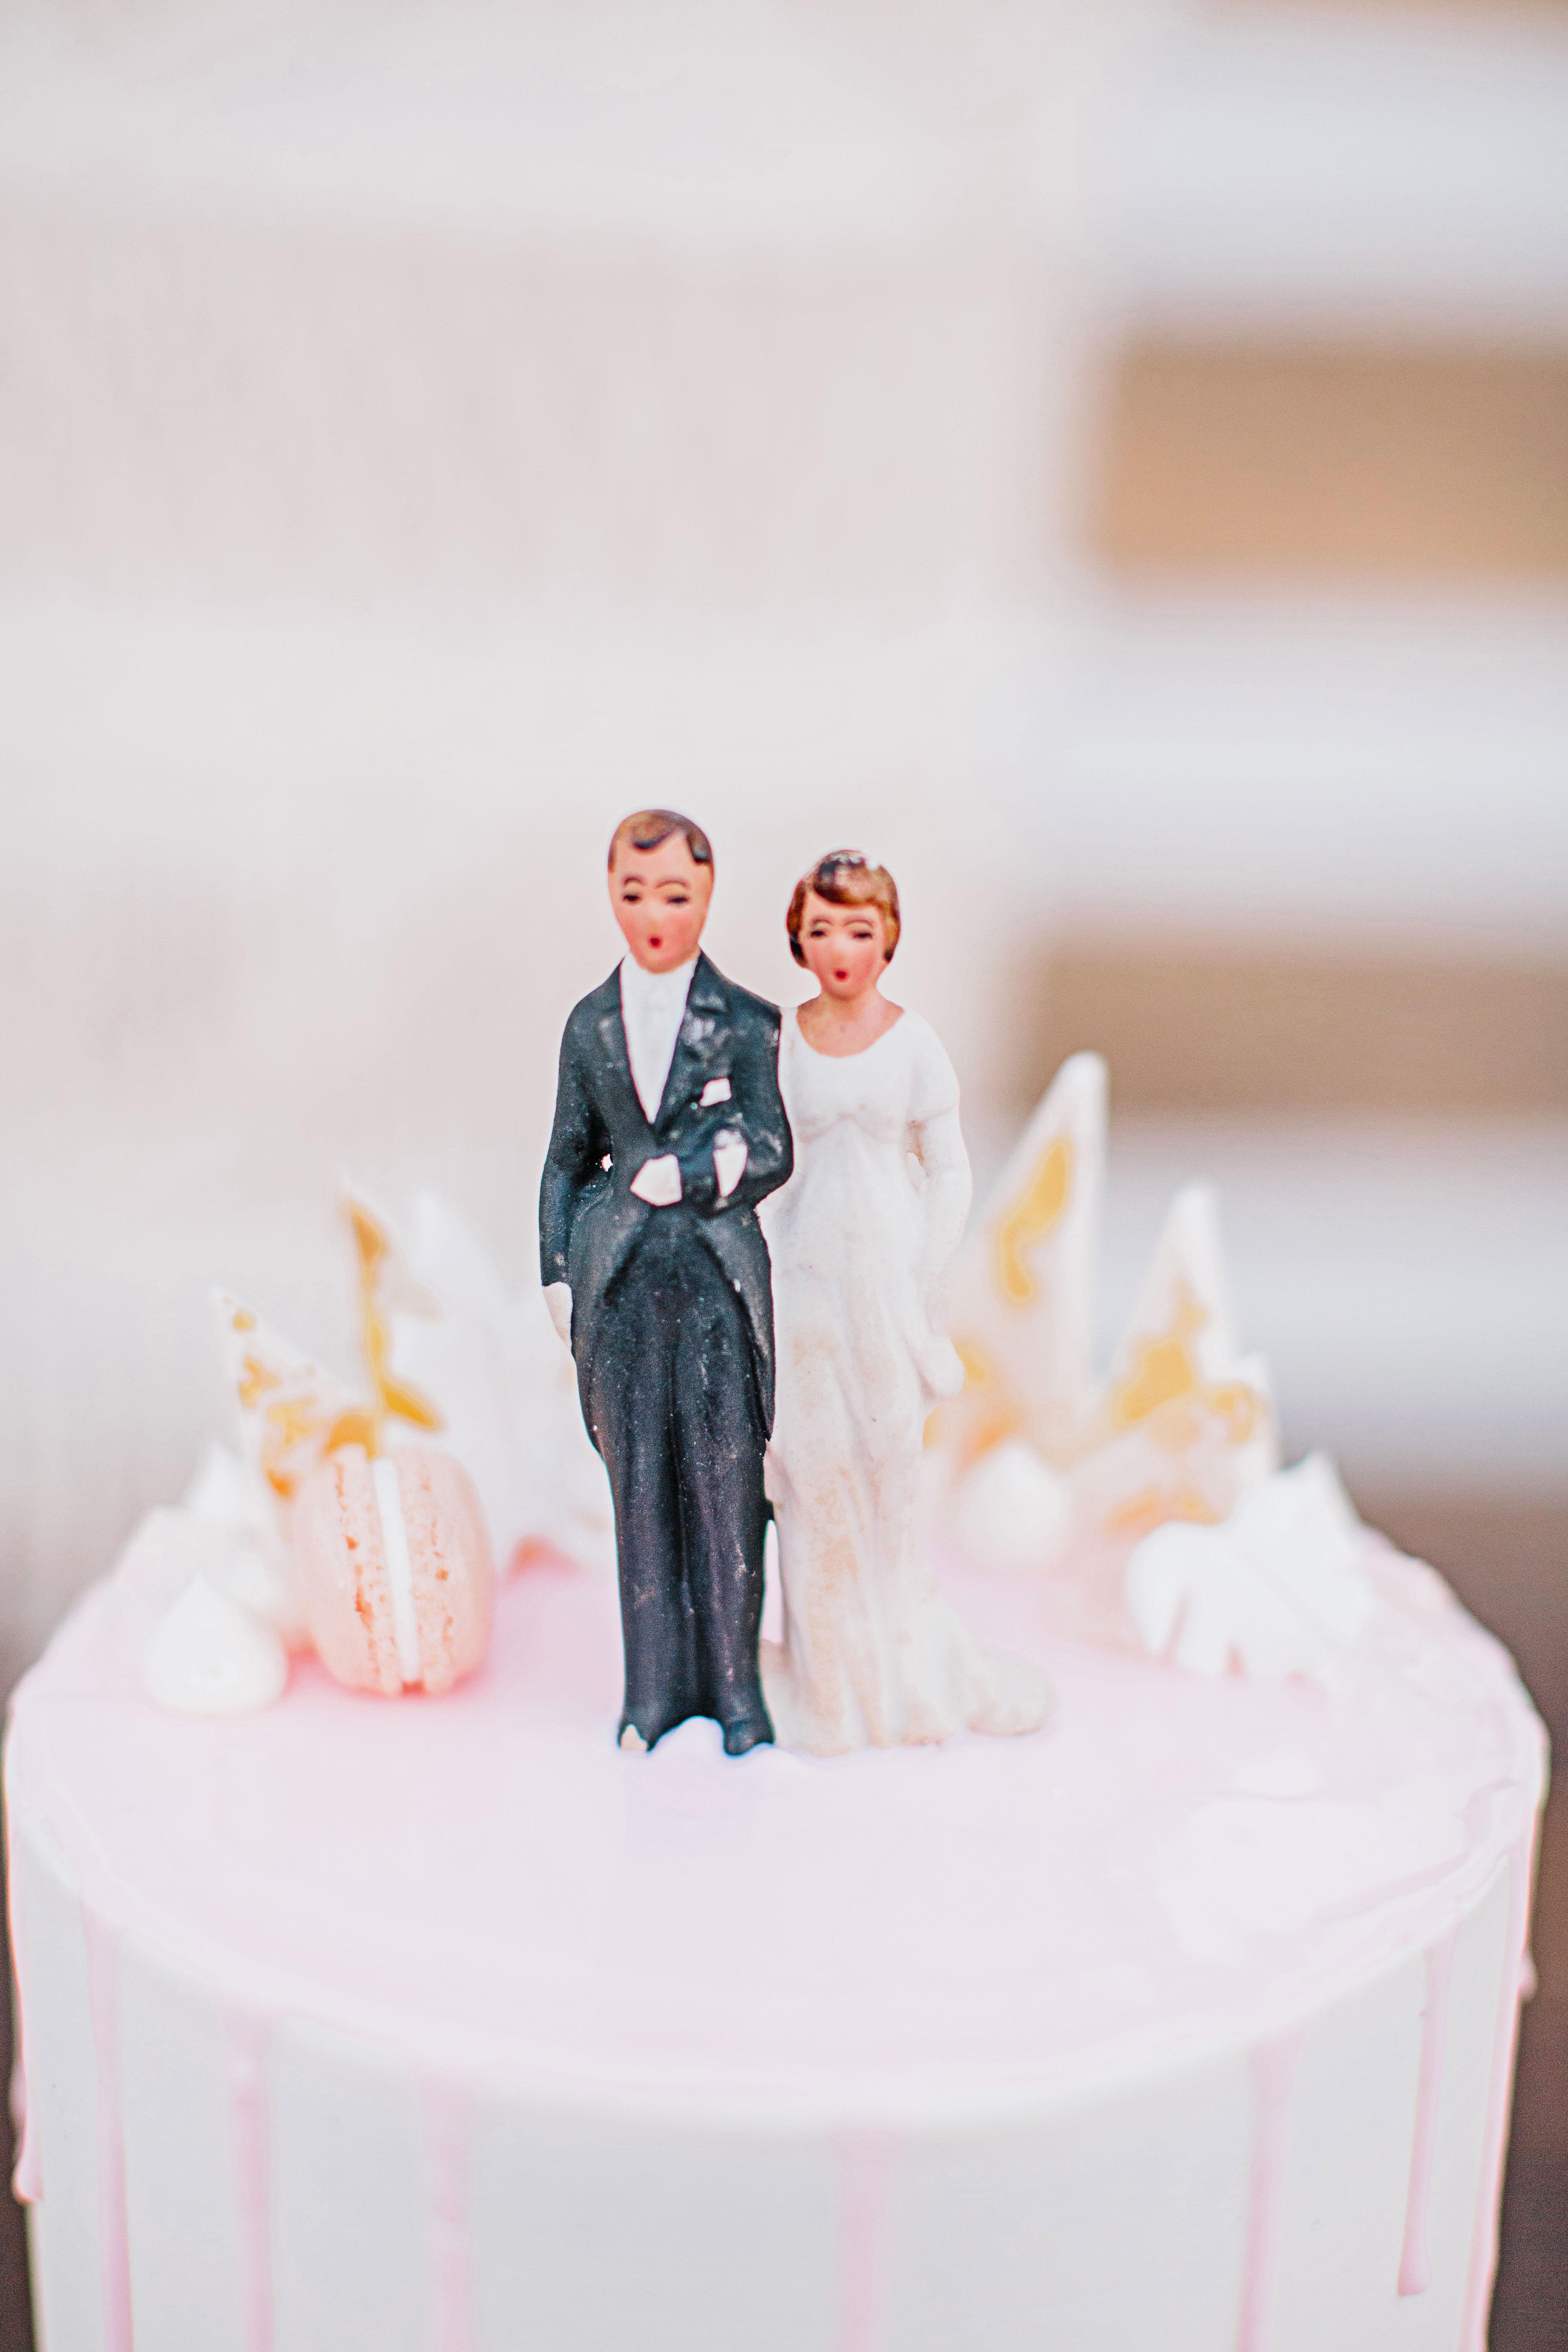 stephanie jared wedding cake topper